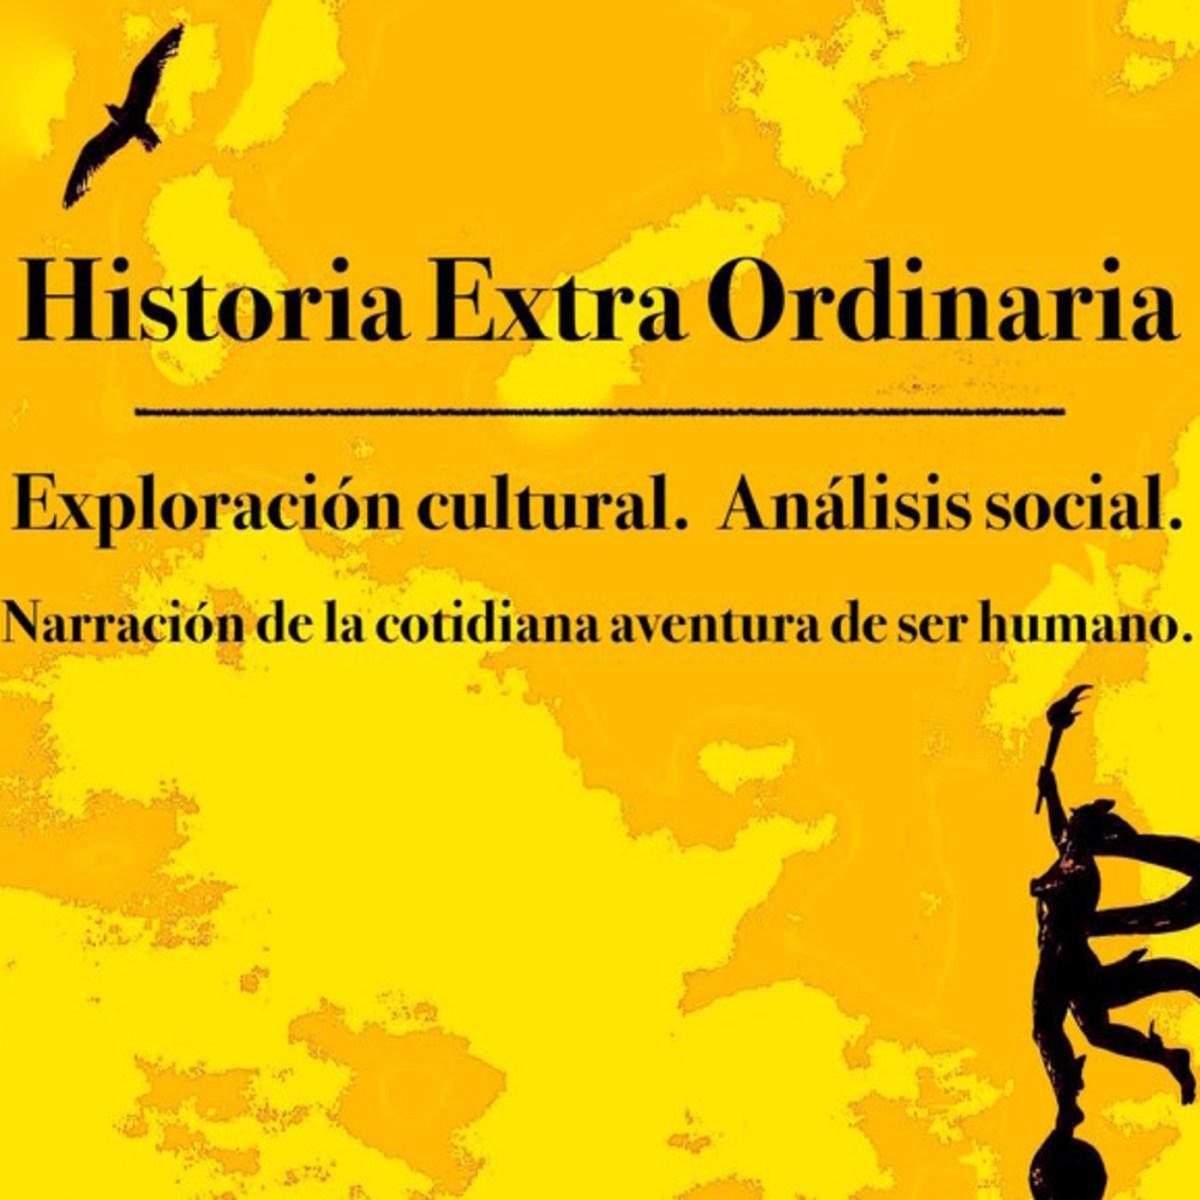 Historia Extra Ordinaria